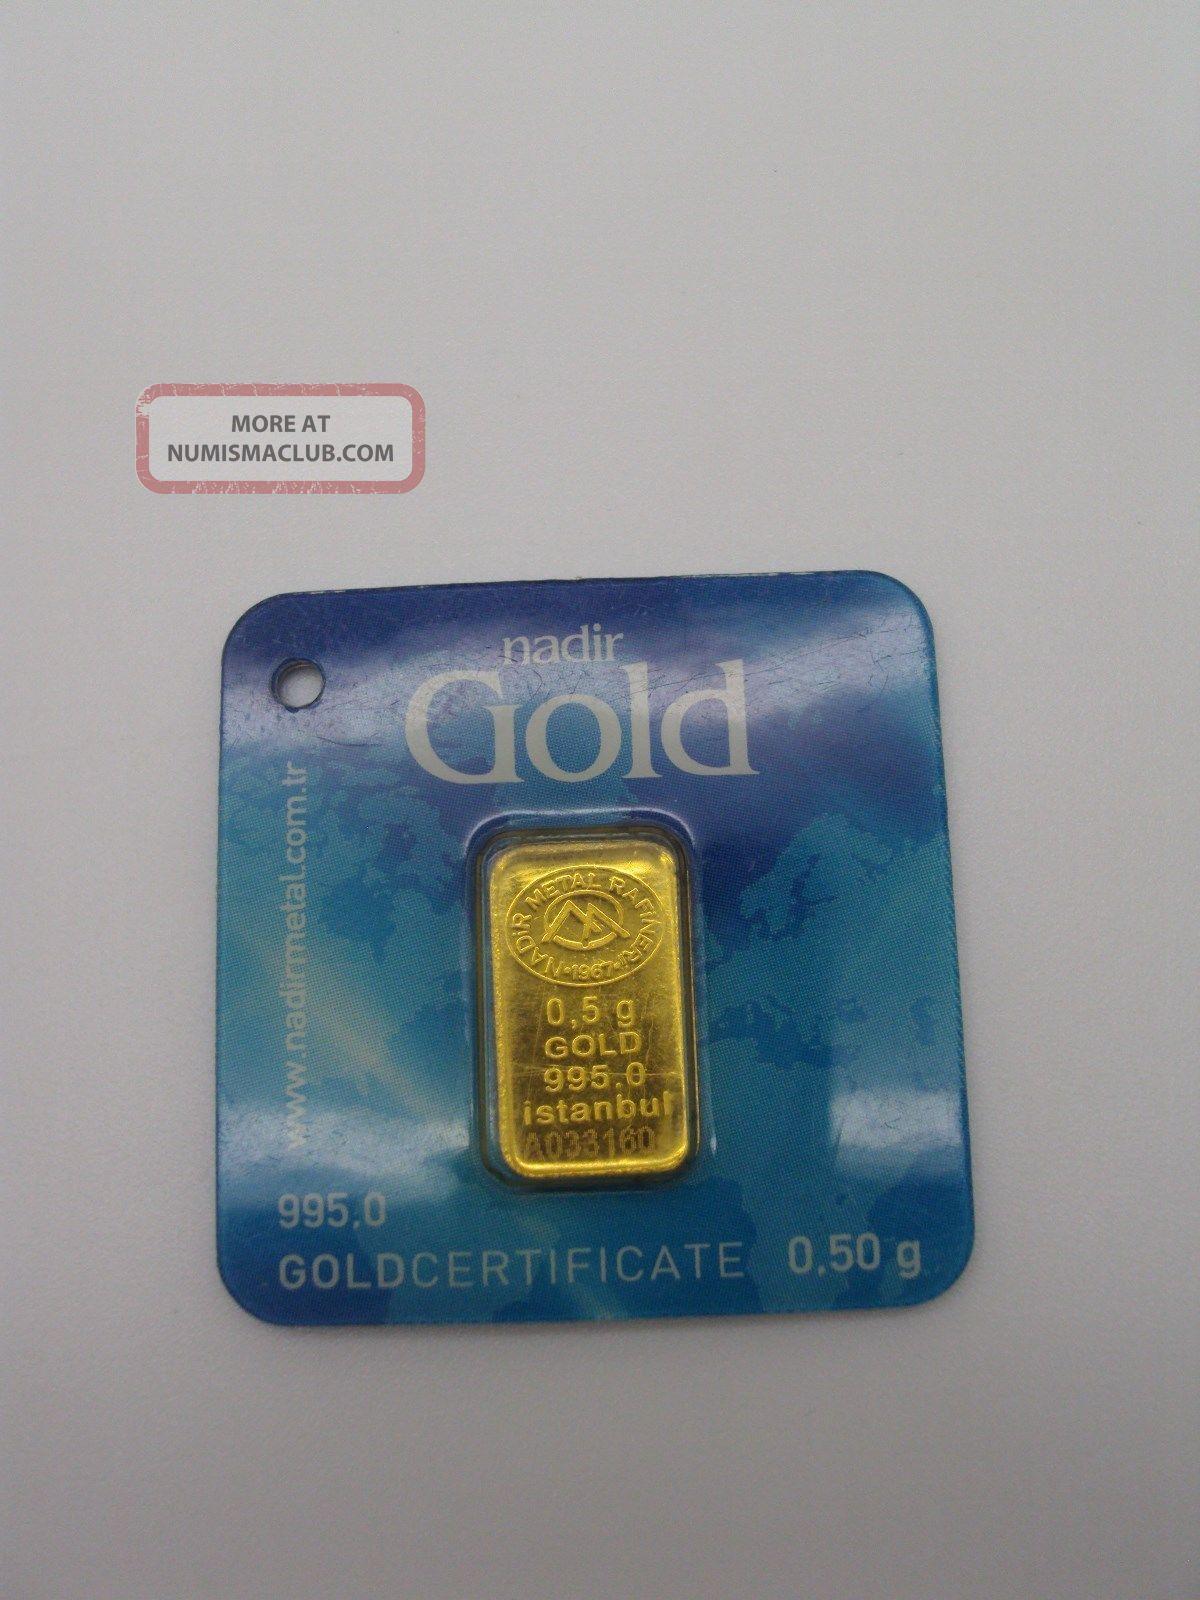 Fine Gold 1 2 Gram 995 1000 24 K Nadi̇r Gold 0 50 Gram Lmba Certificate